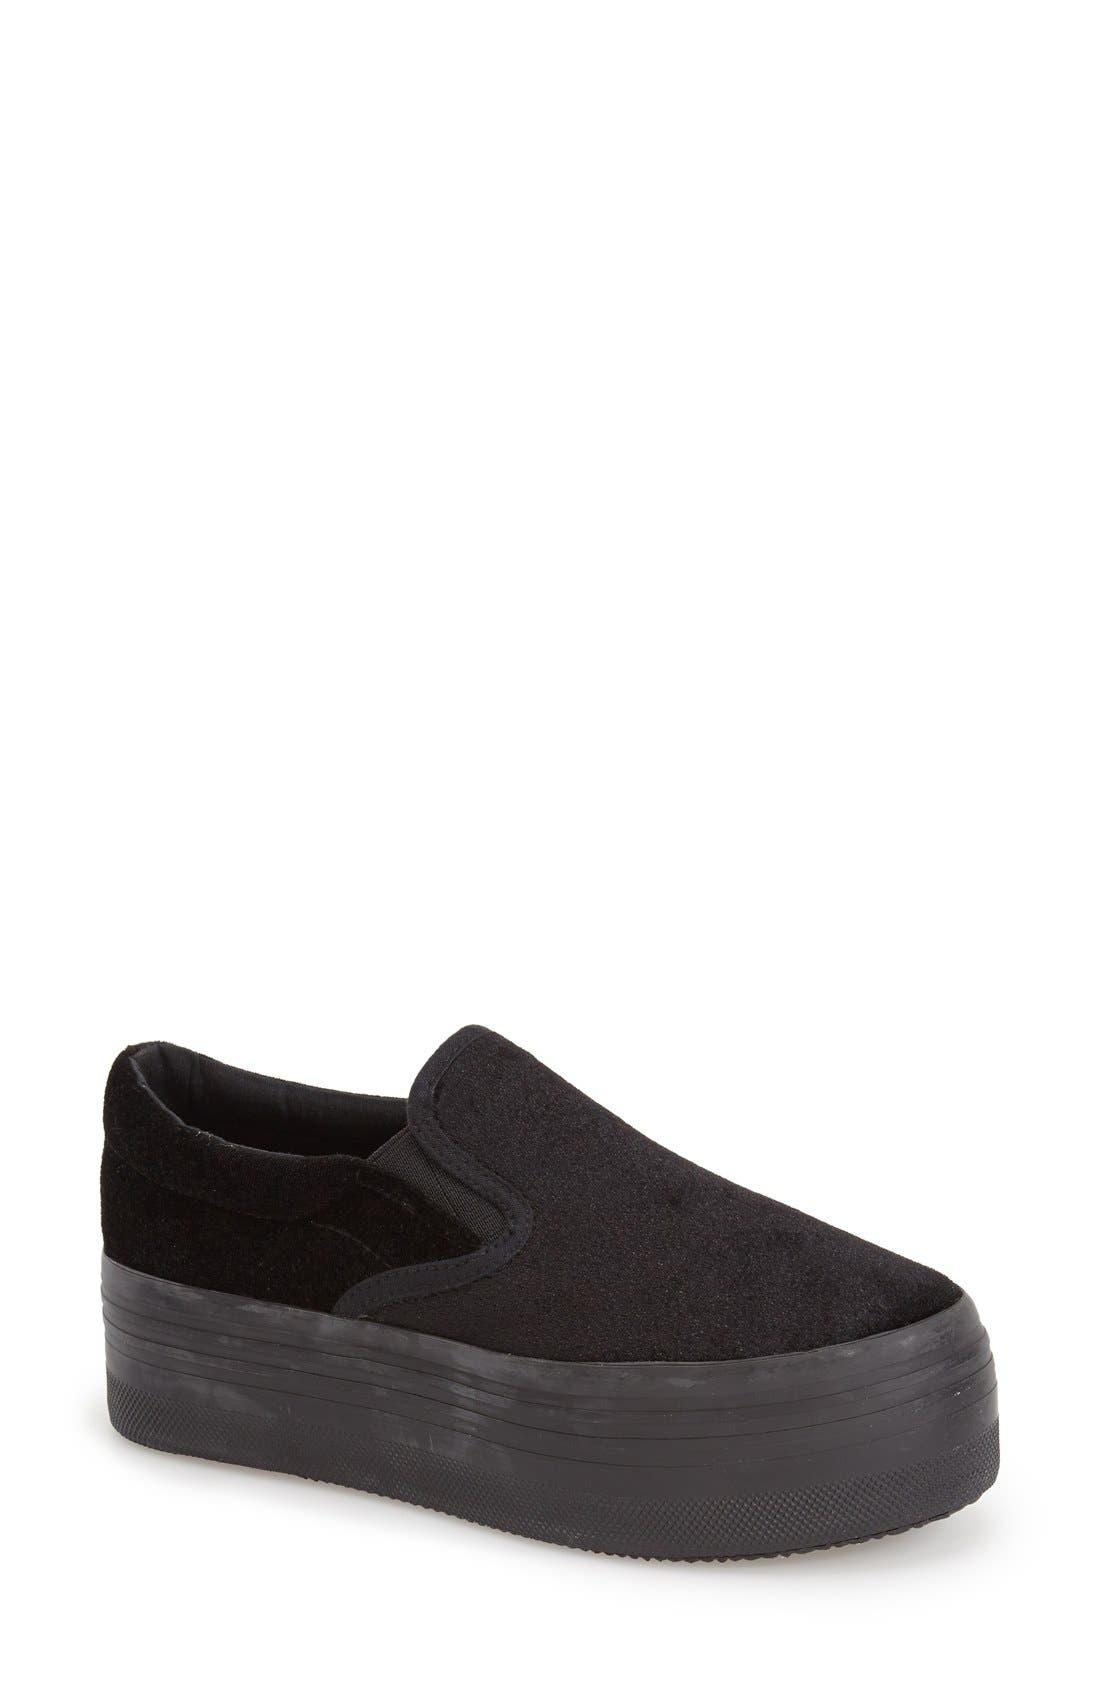 Main Image - Jeffrey Campbell 'See-Ya' Slip-On Platform Sneaker (Women)